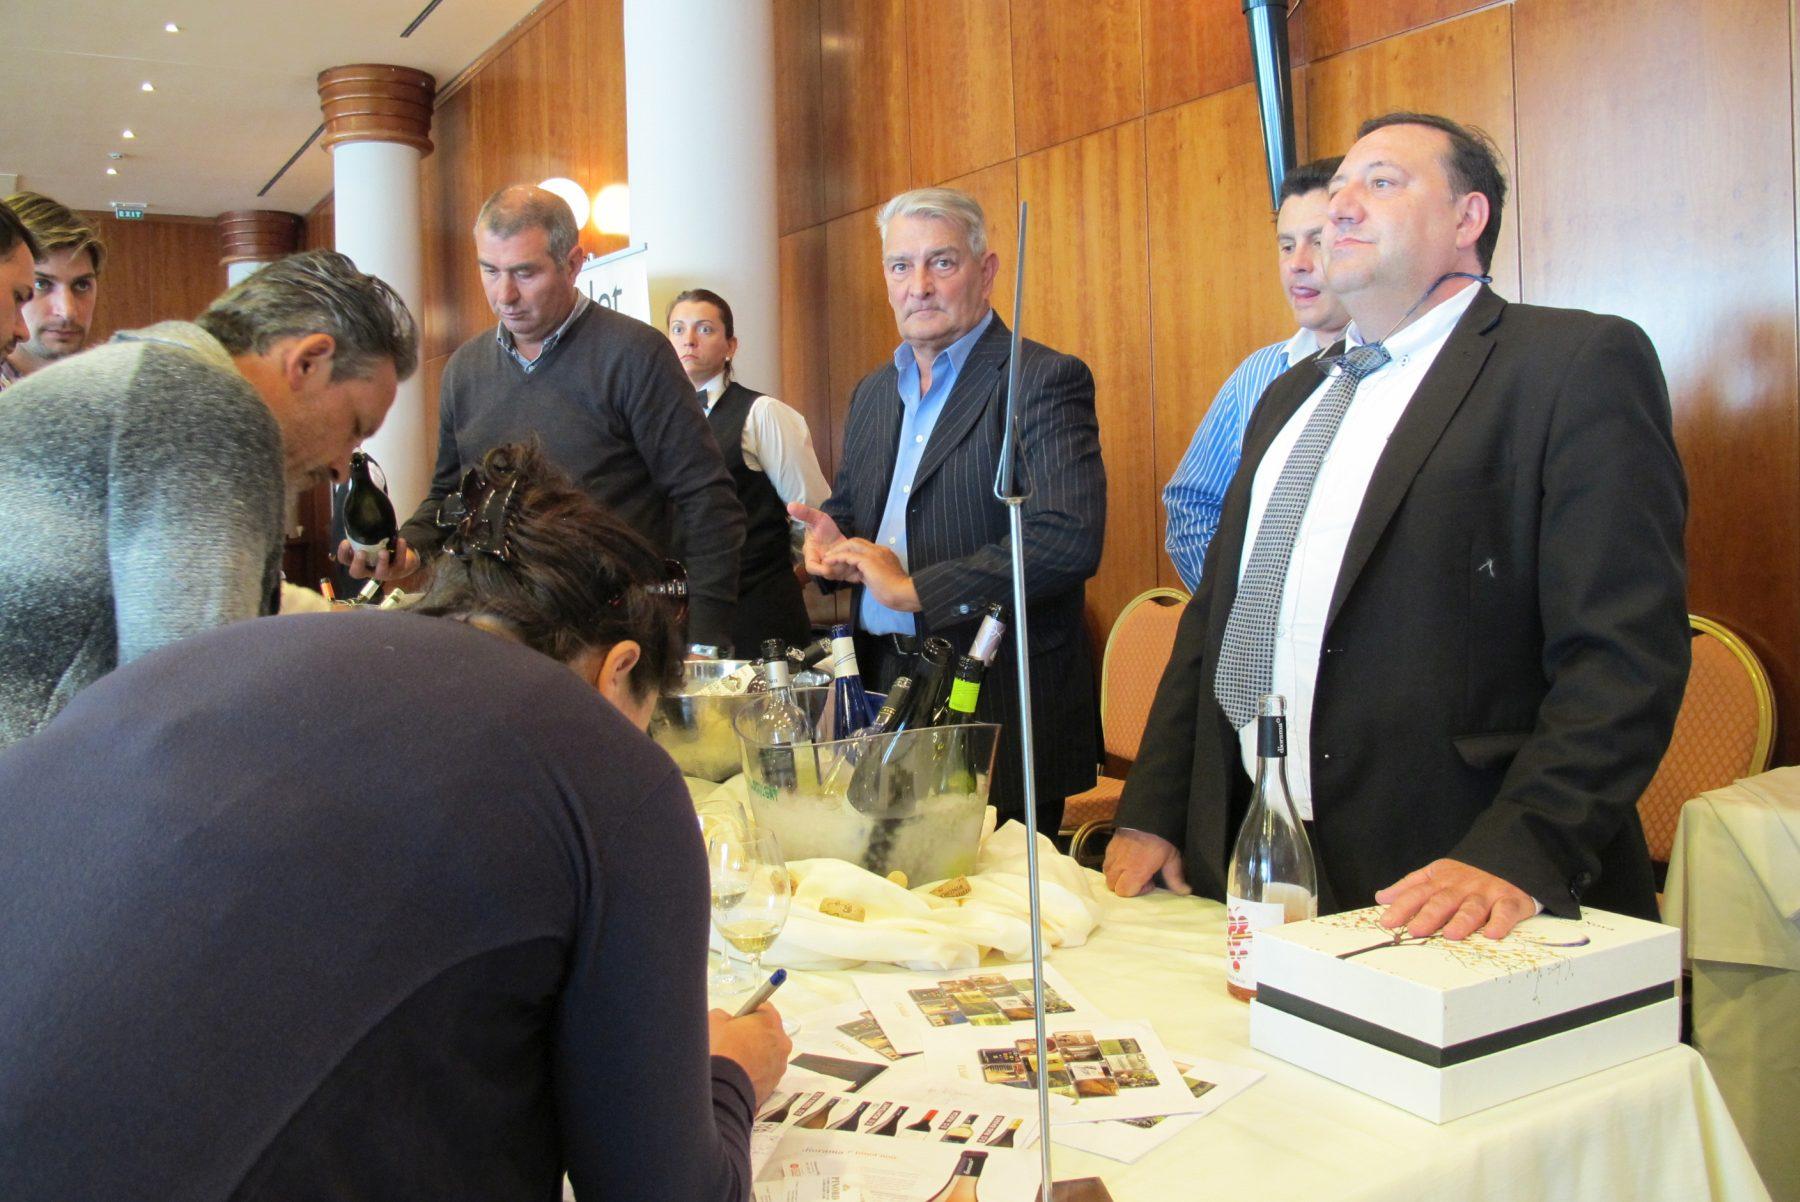 Creatast 2017 la gran gala dels vins del pened s a for Parato vinicola